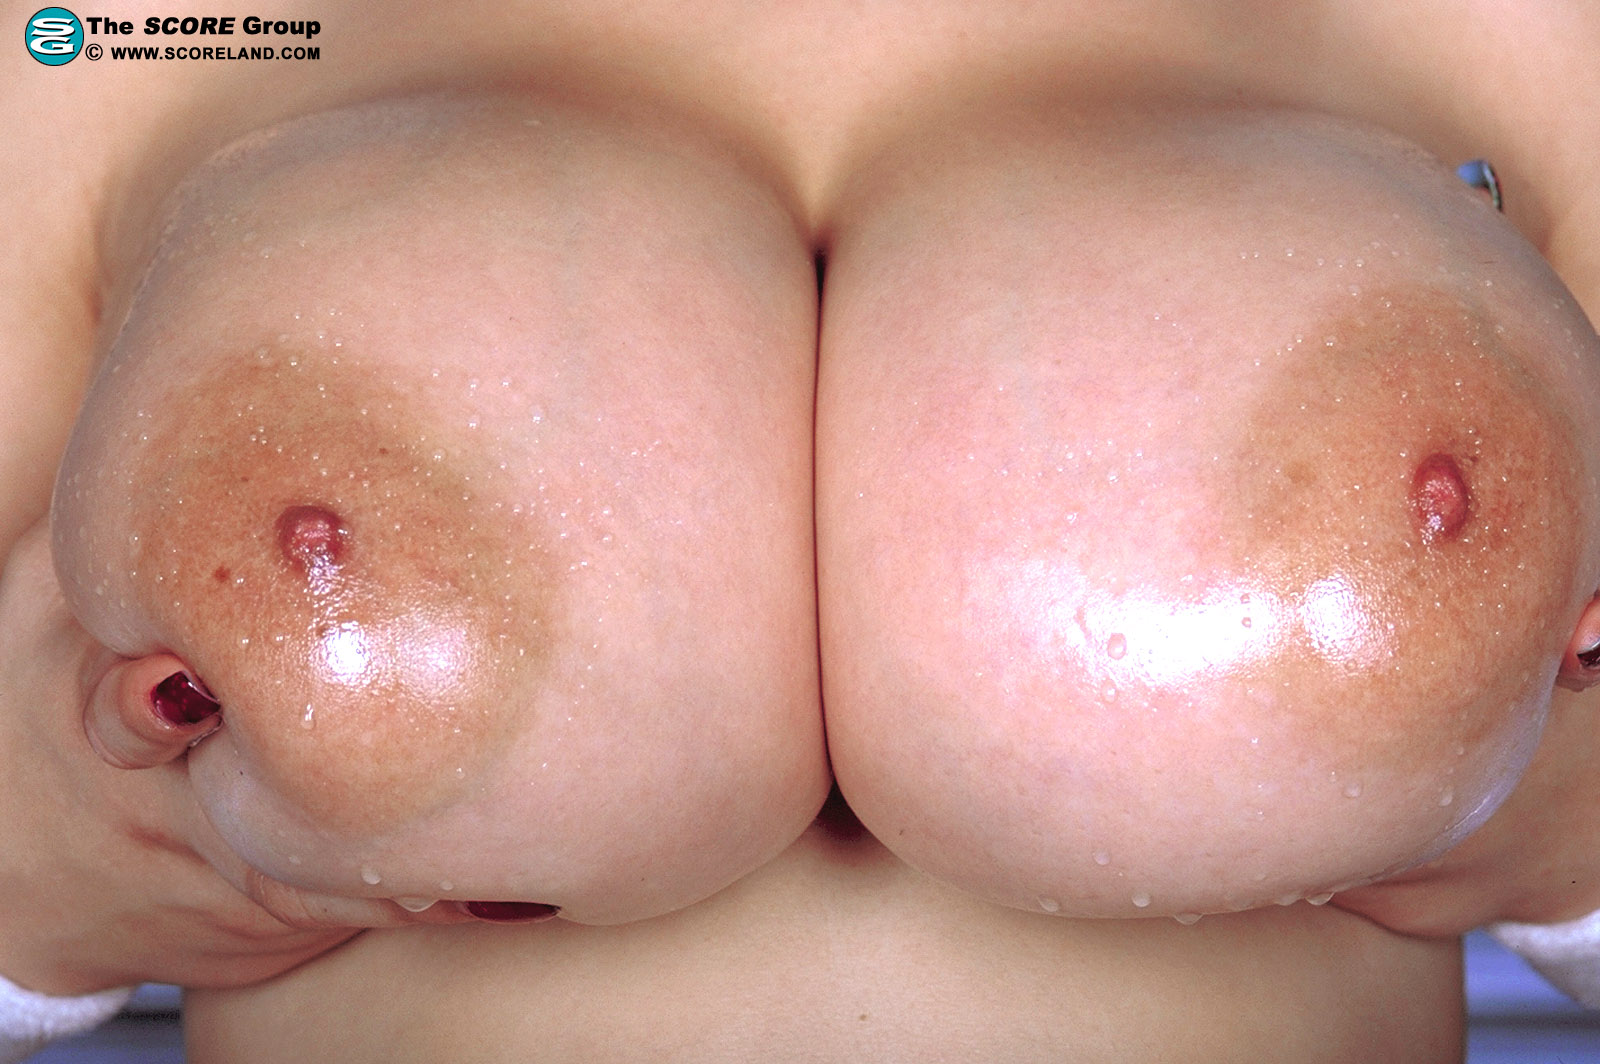 http://2.bp.blogspot.com/-s4k4P6xn0Fc/T-B6DaQjmrI/AAAAAAAAKEI/bnq1FNapBX4/s1600/Sharday25.jpg